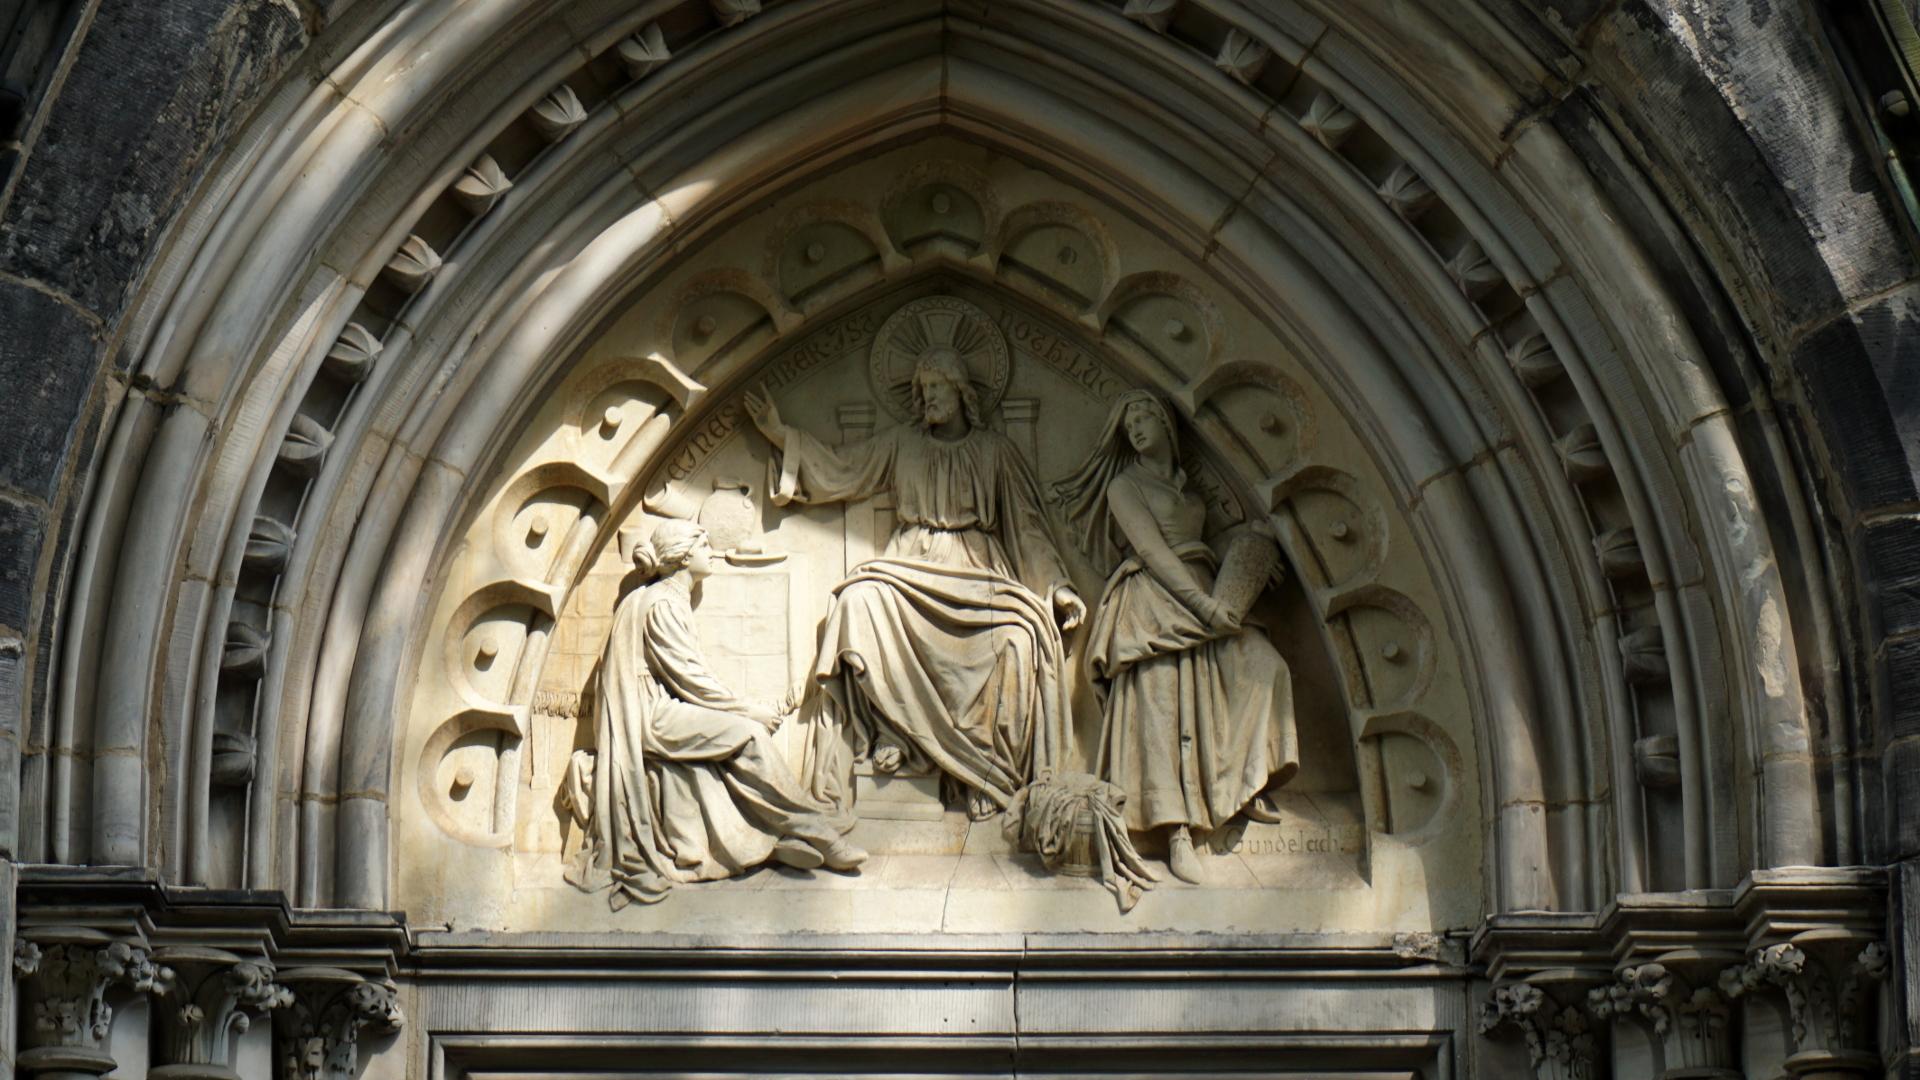 Tympanon über dem Portal der Gartenkirche